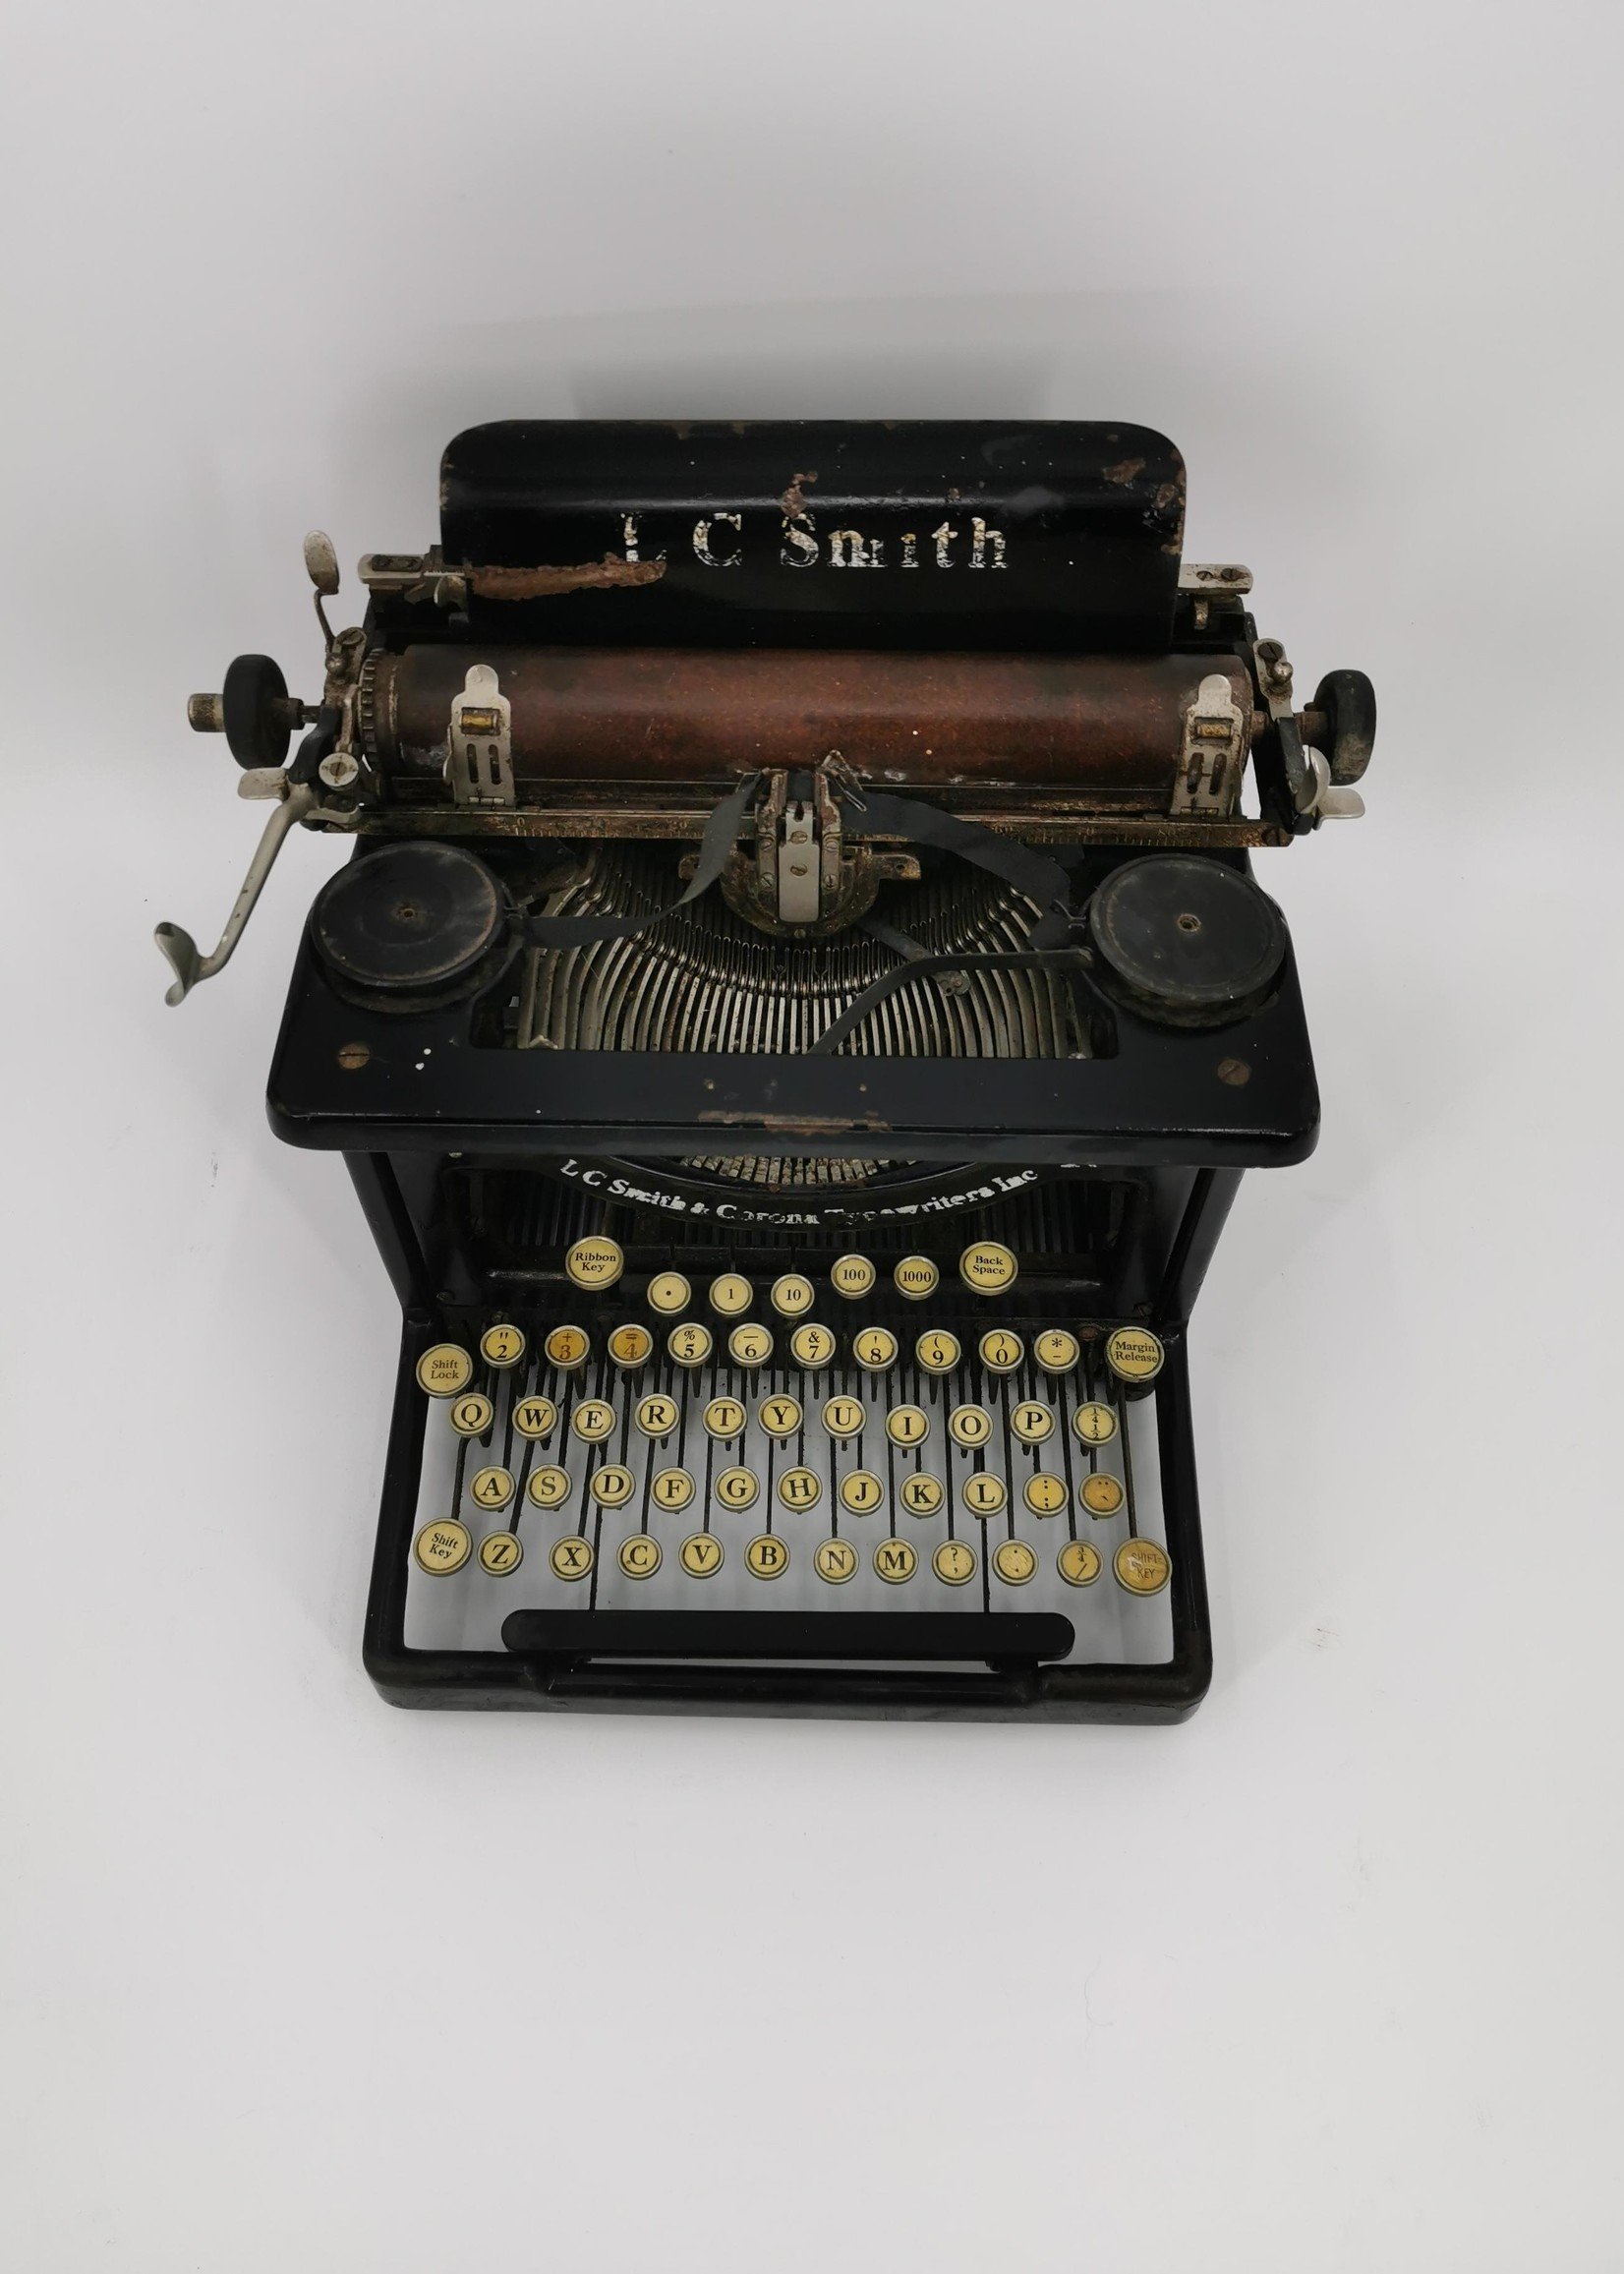 LC Smith & Corona typemachine